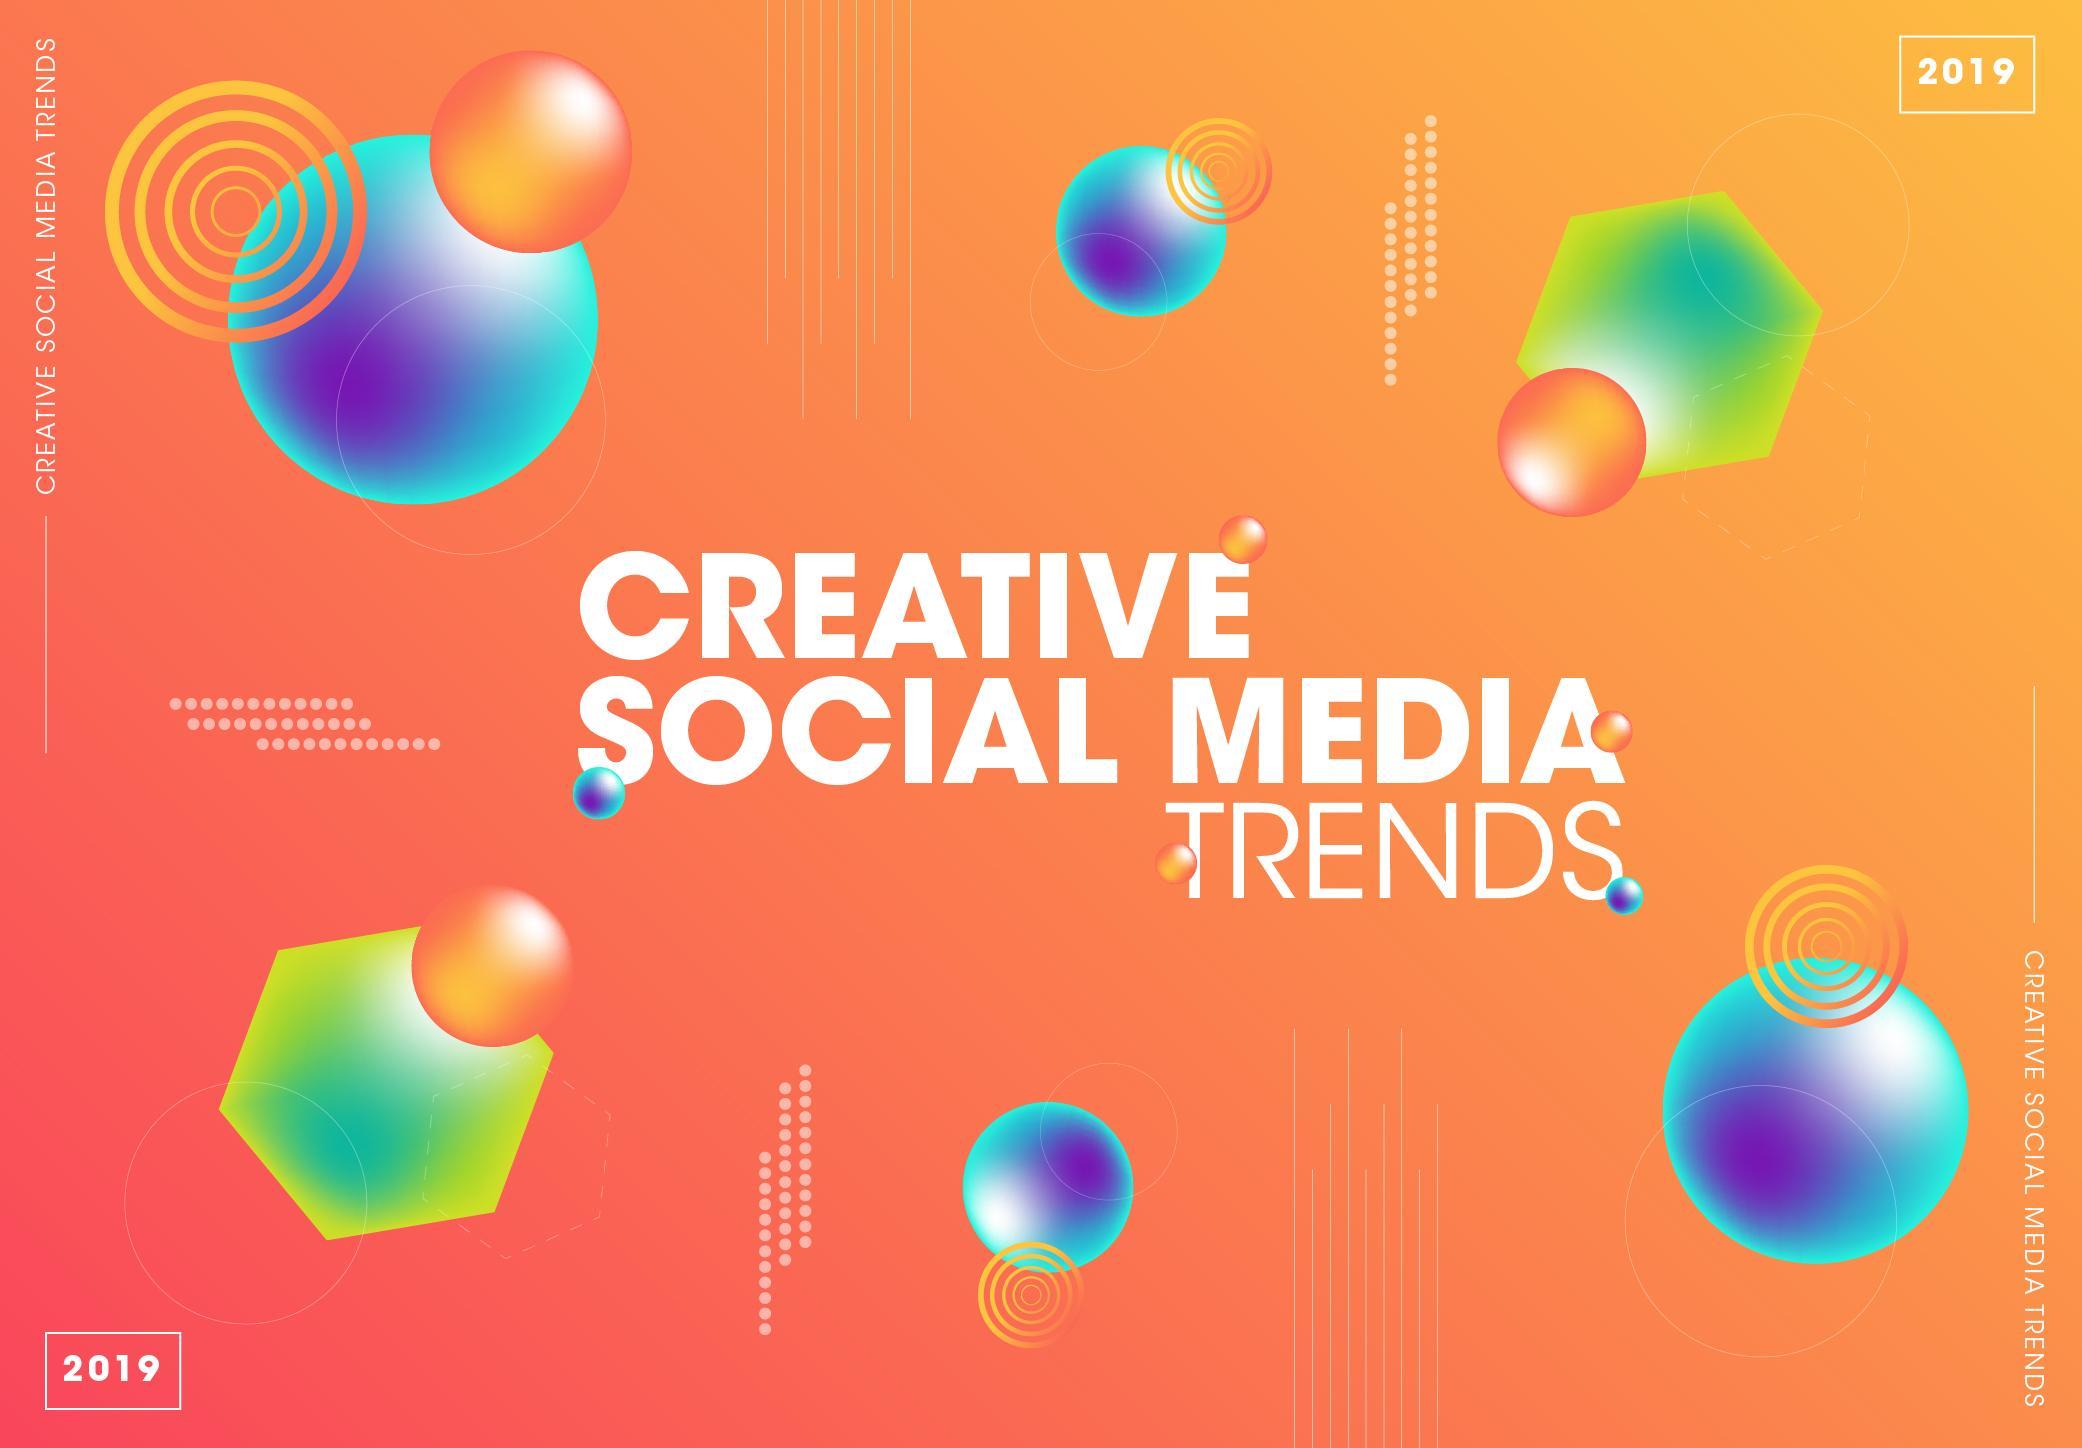 CREATIVE SOCIAL MEDIA TRENDS - News